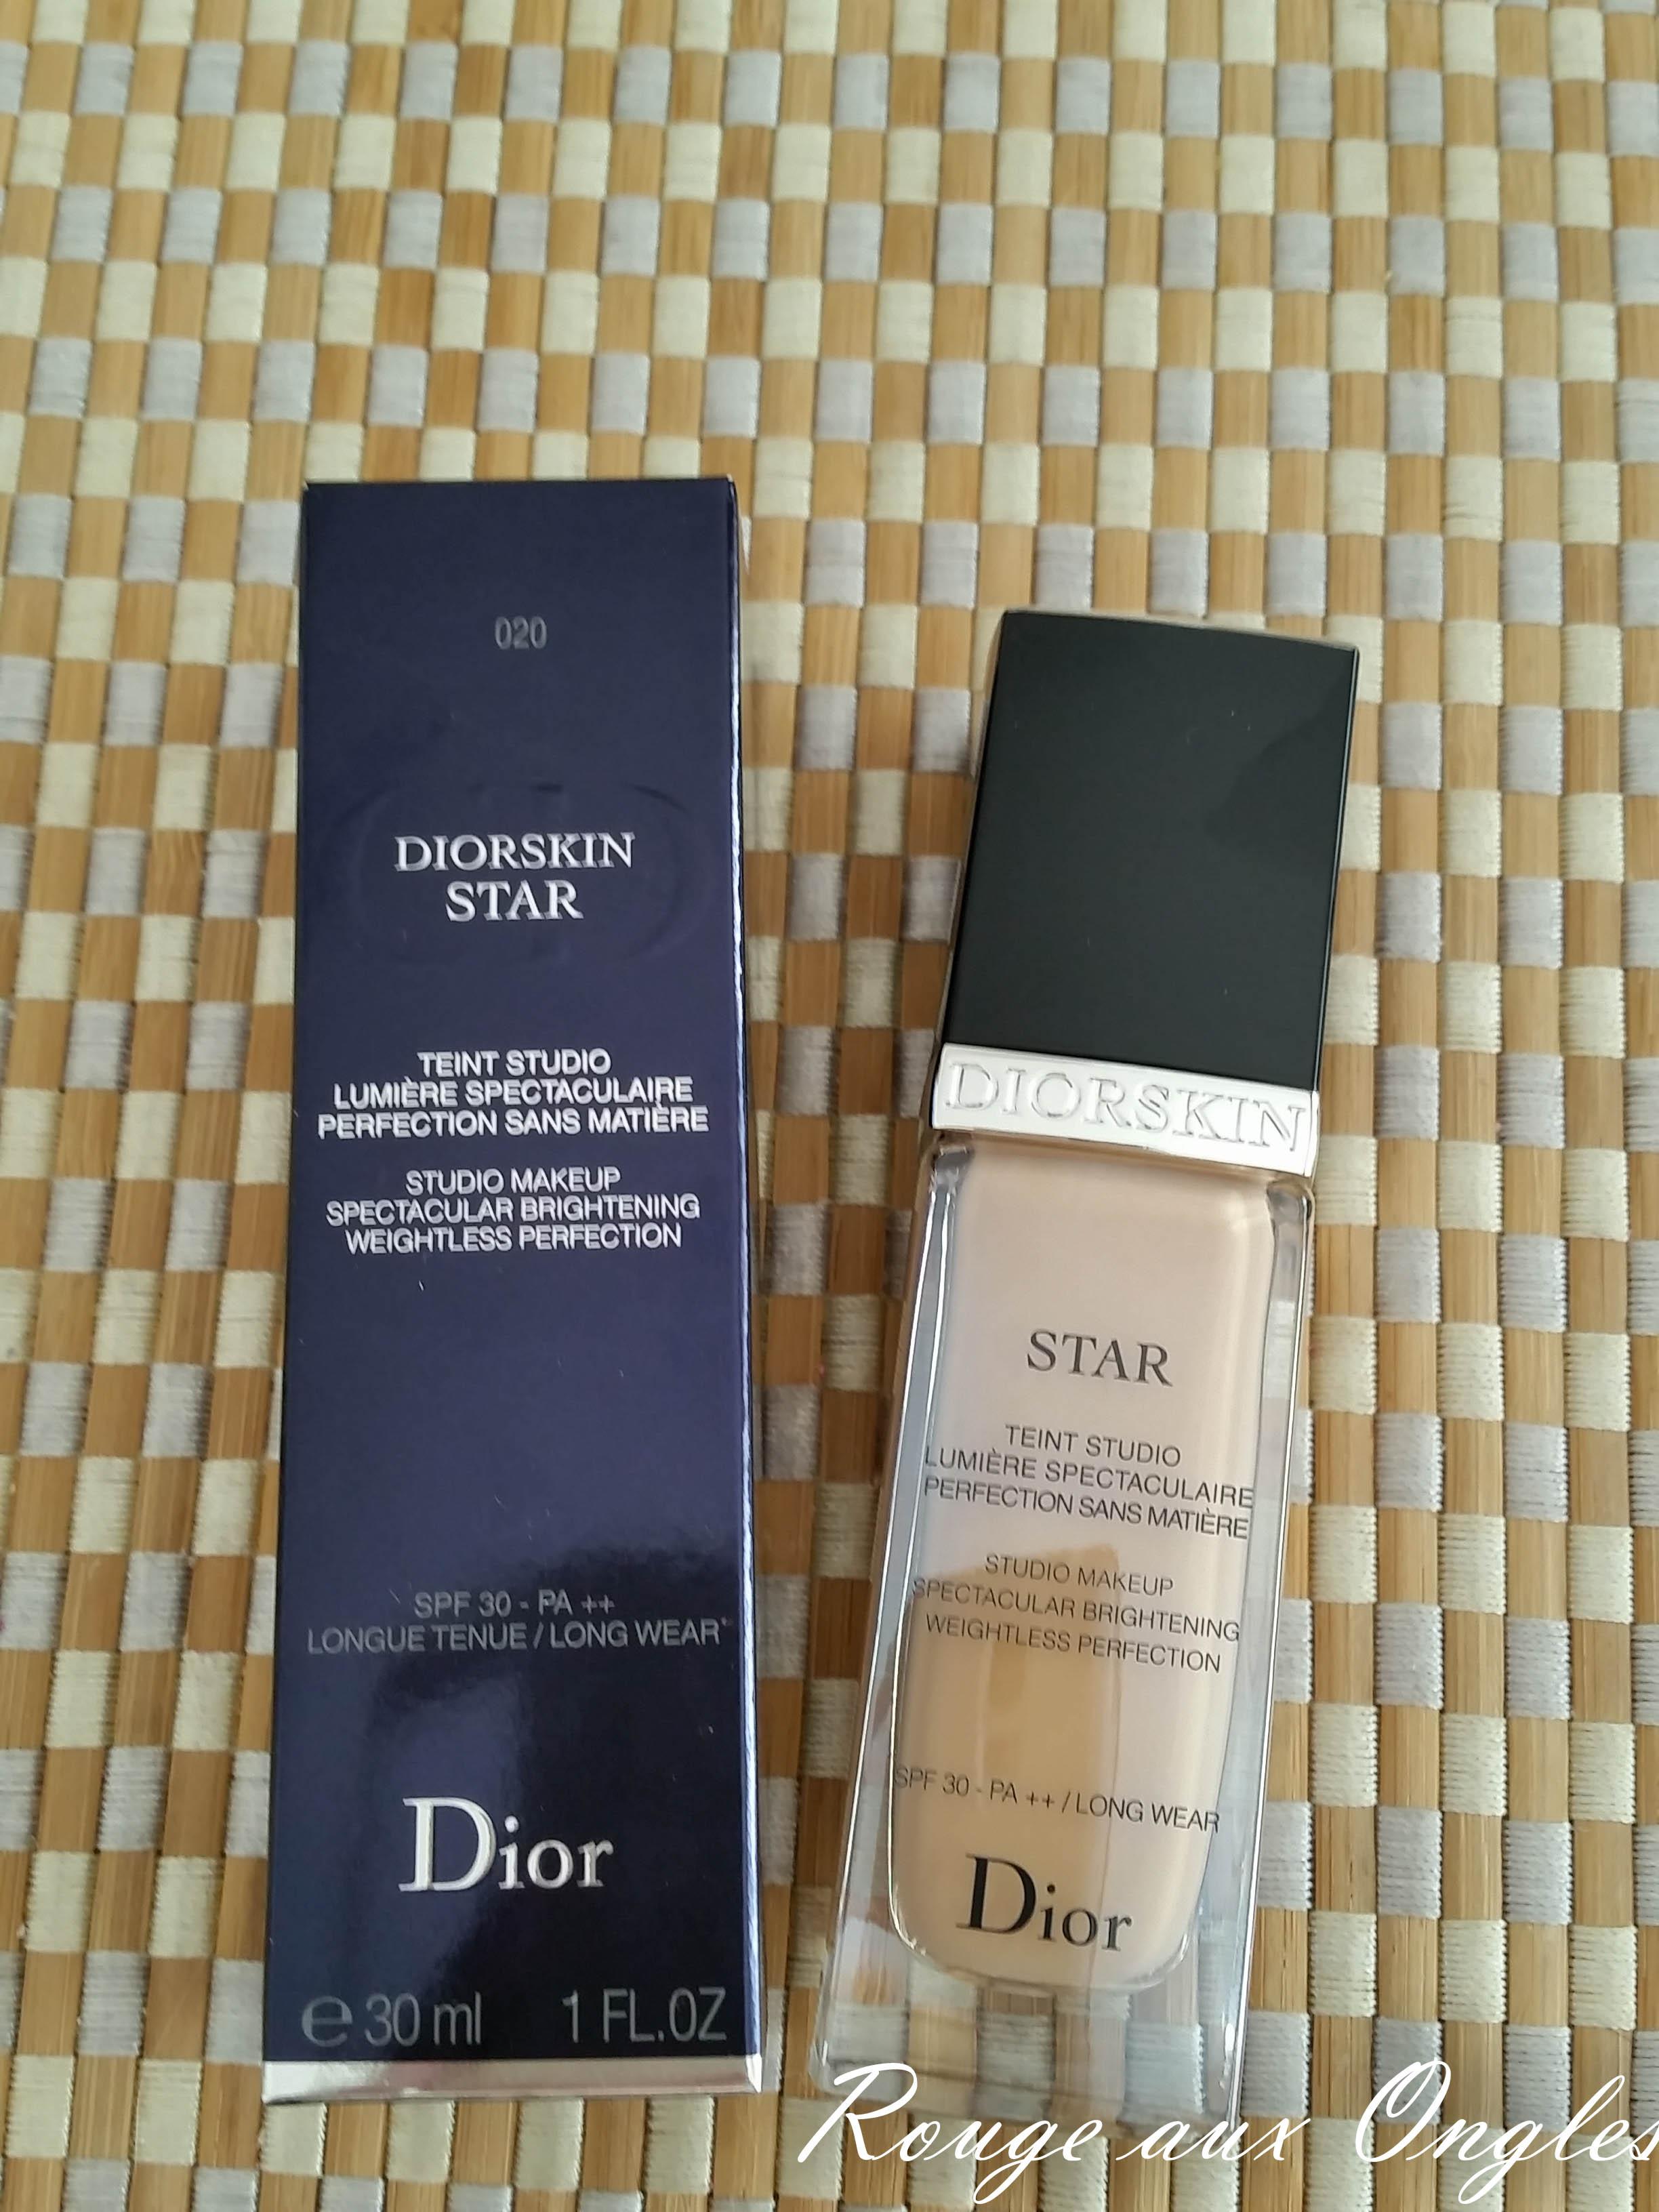 Star de Dior - Rouge aux Ongles